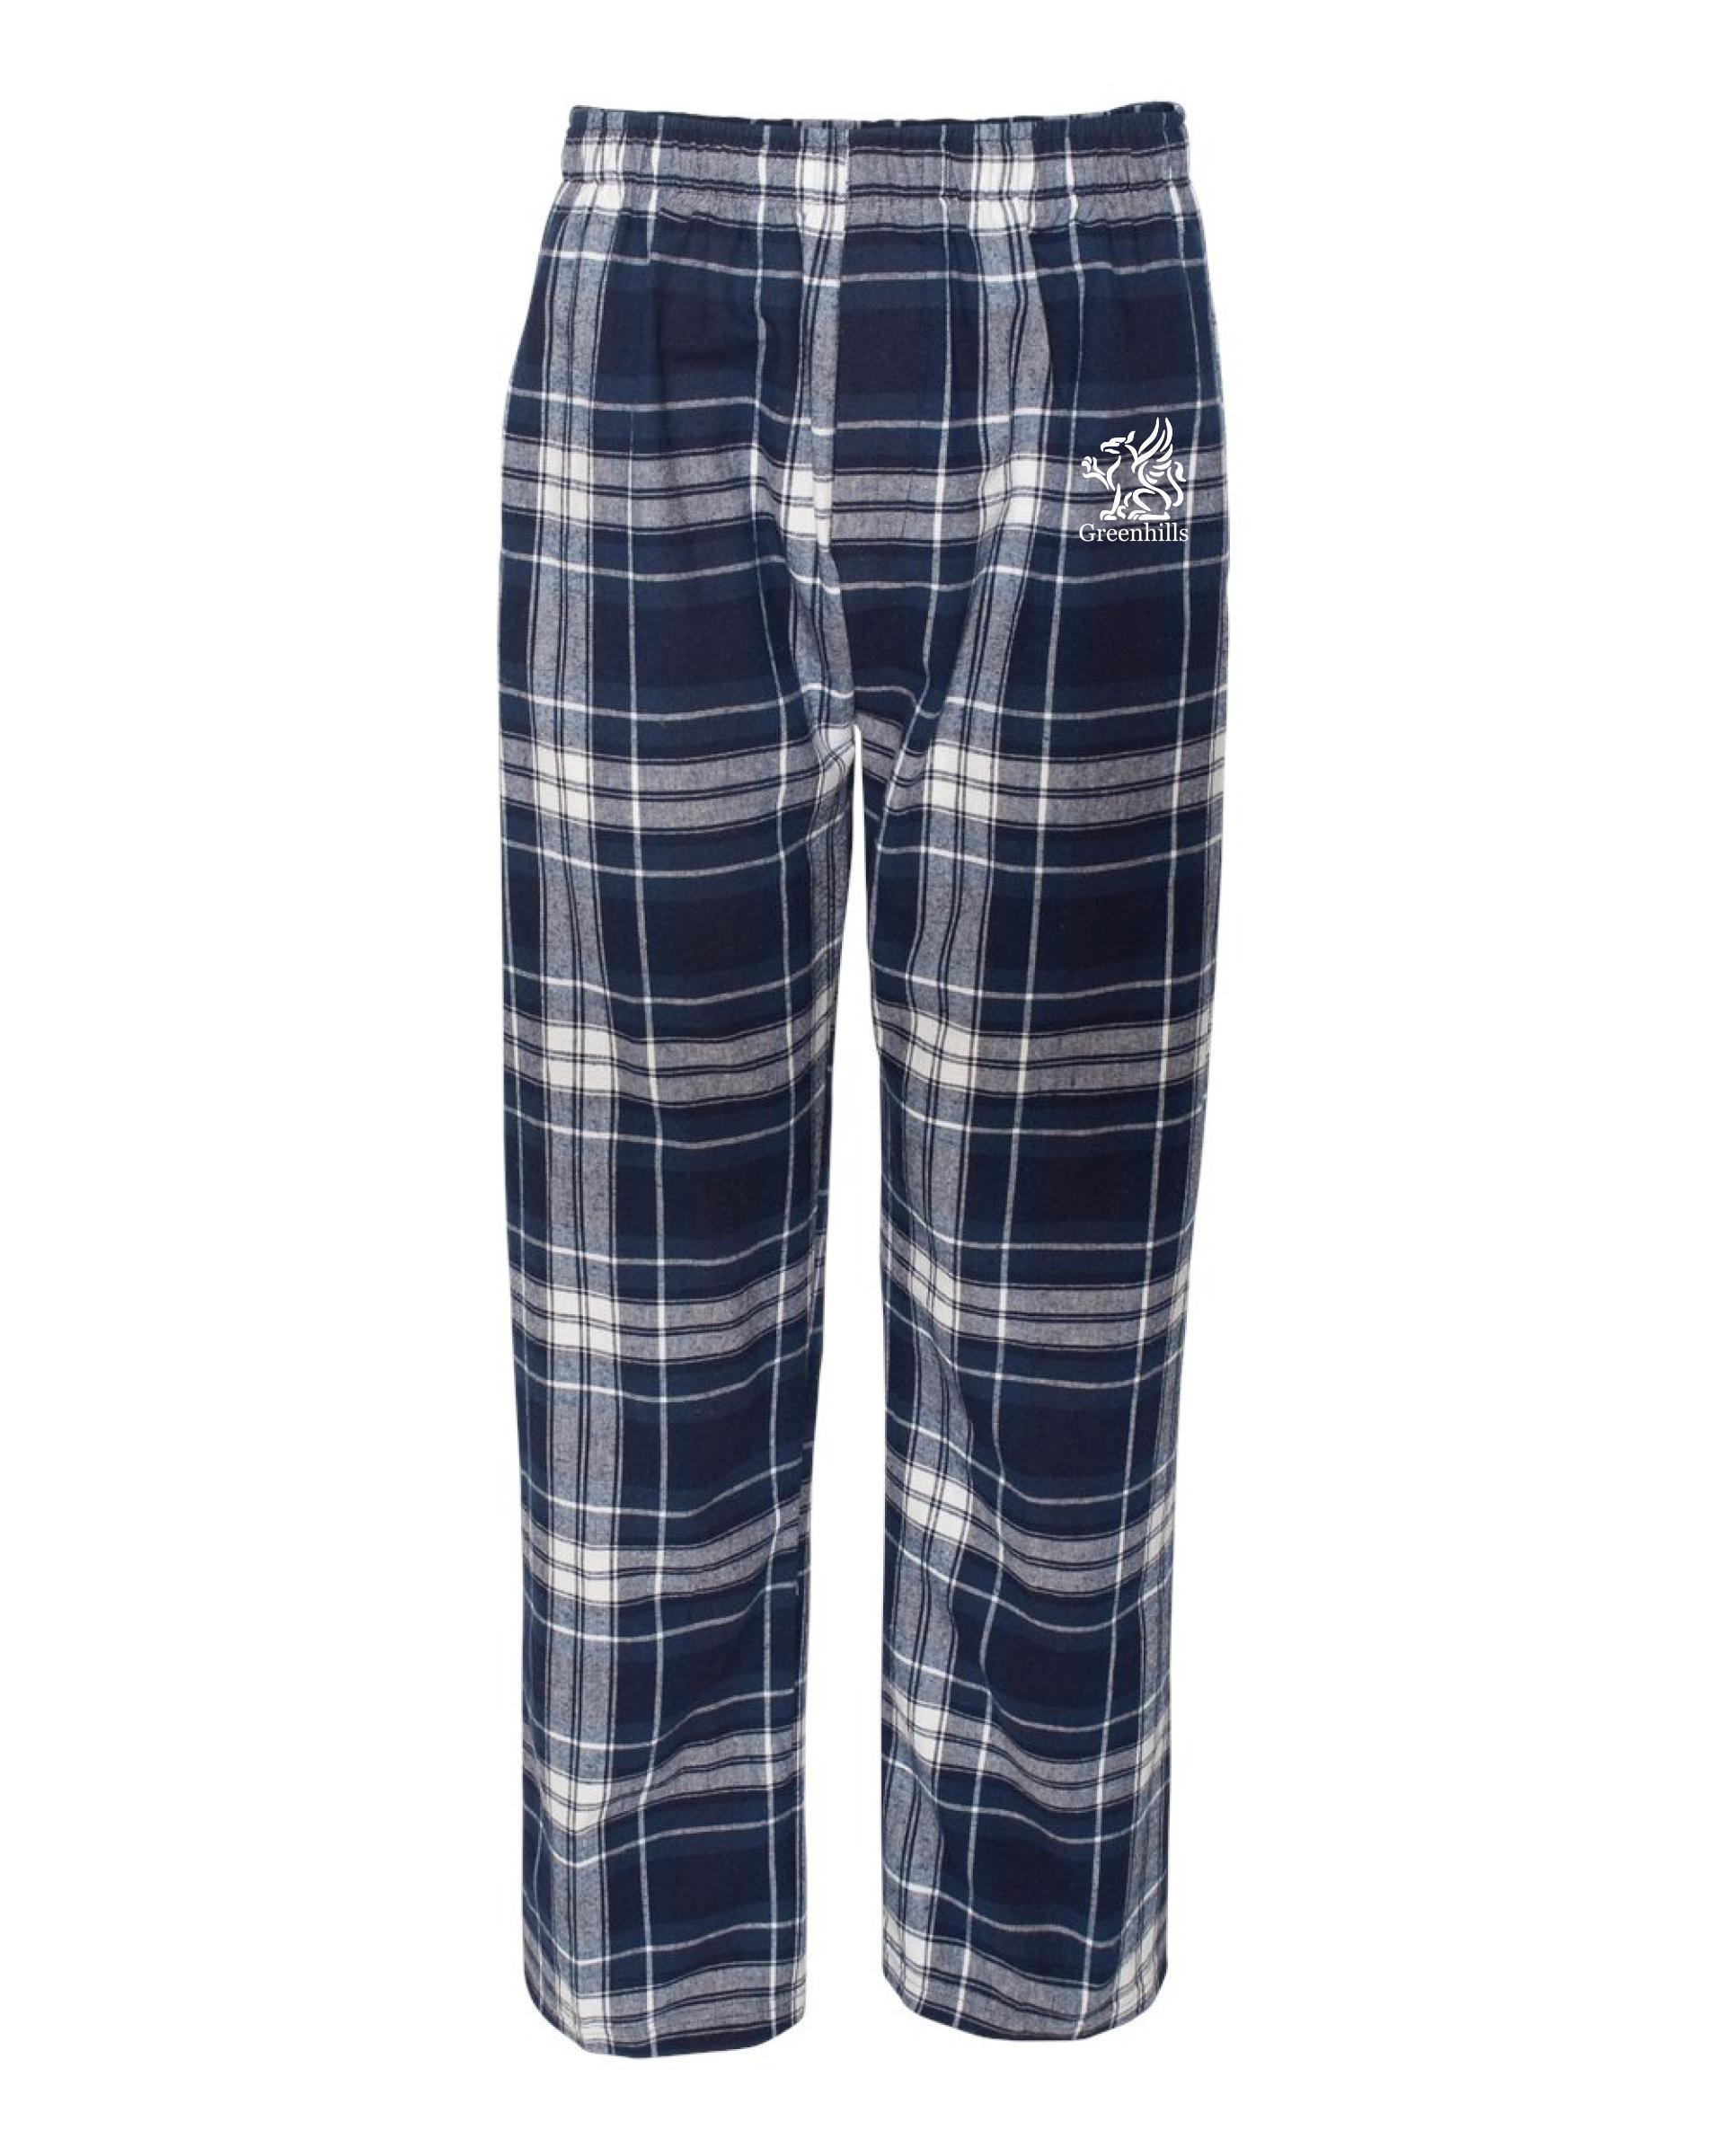 1bc40216da72 Unisex Flannel Pants - Threads Custom Gear